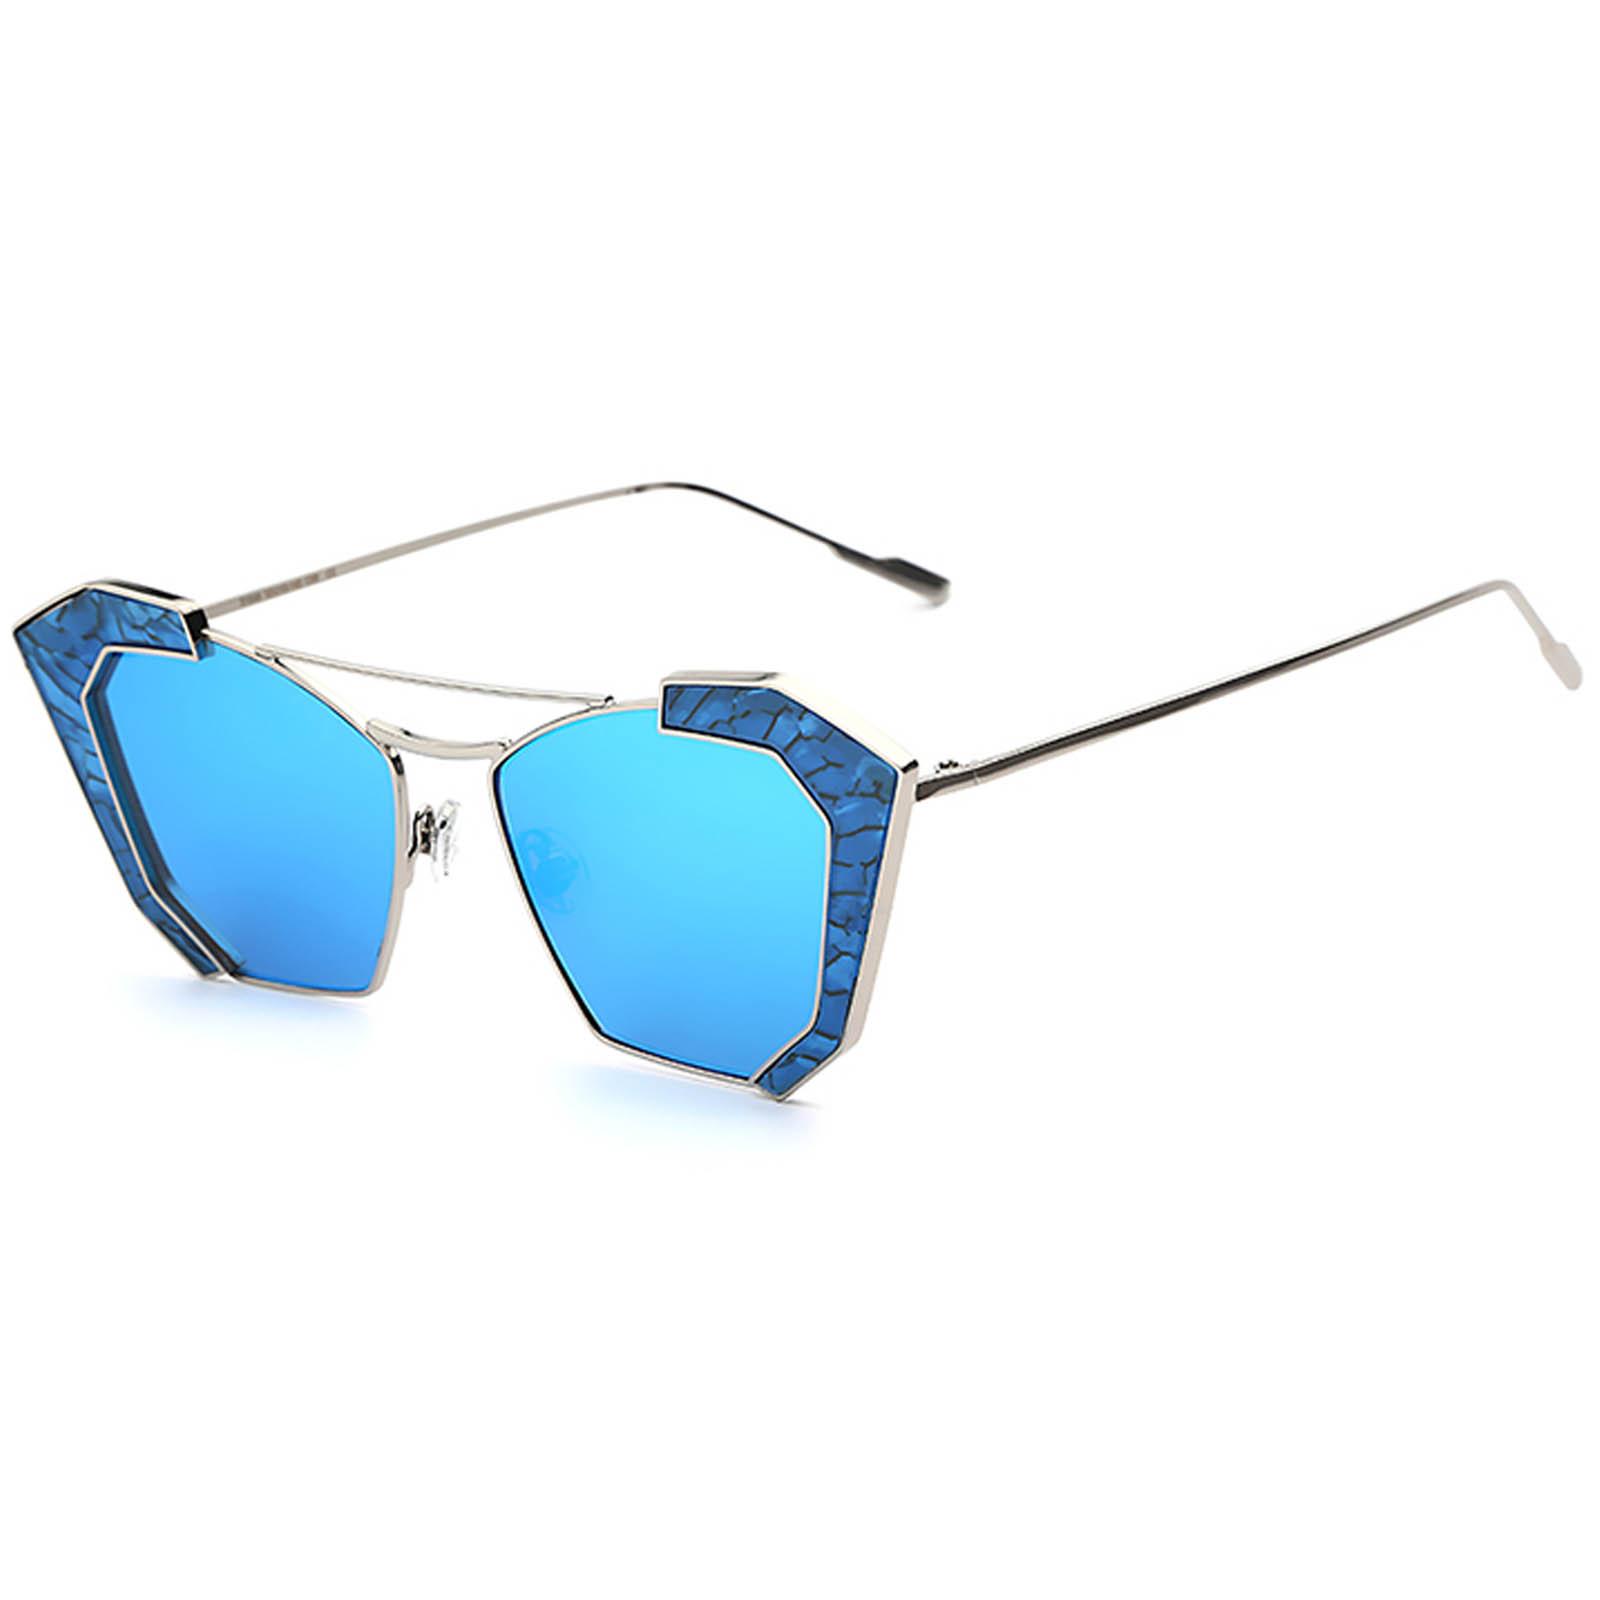 OWL ® 016 C7 Cat Rectangle Eyewear Sunglasses Women's Men's Metal Silver Frame Blue Lens One Pair